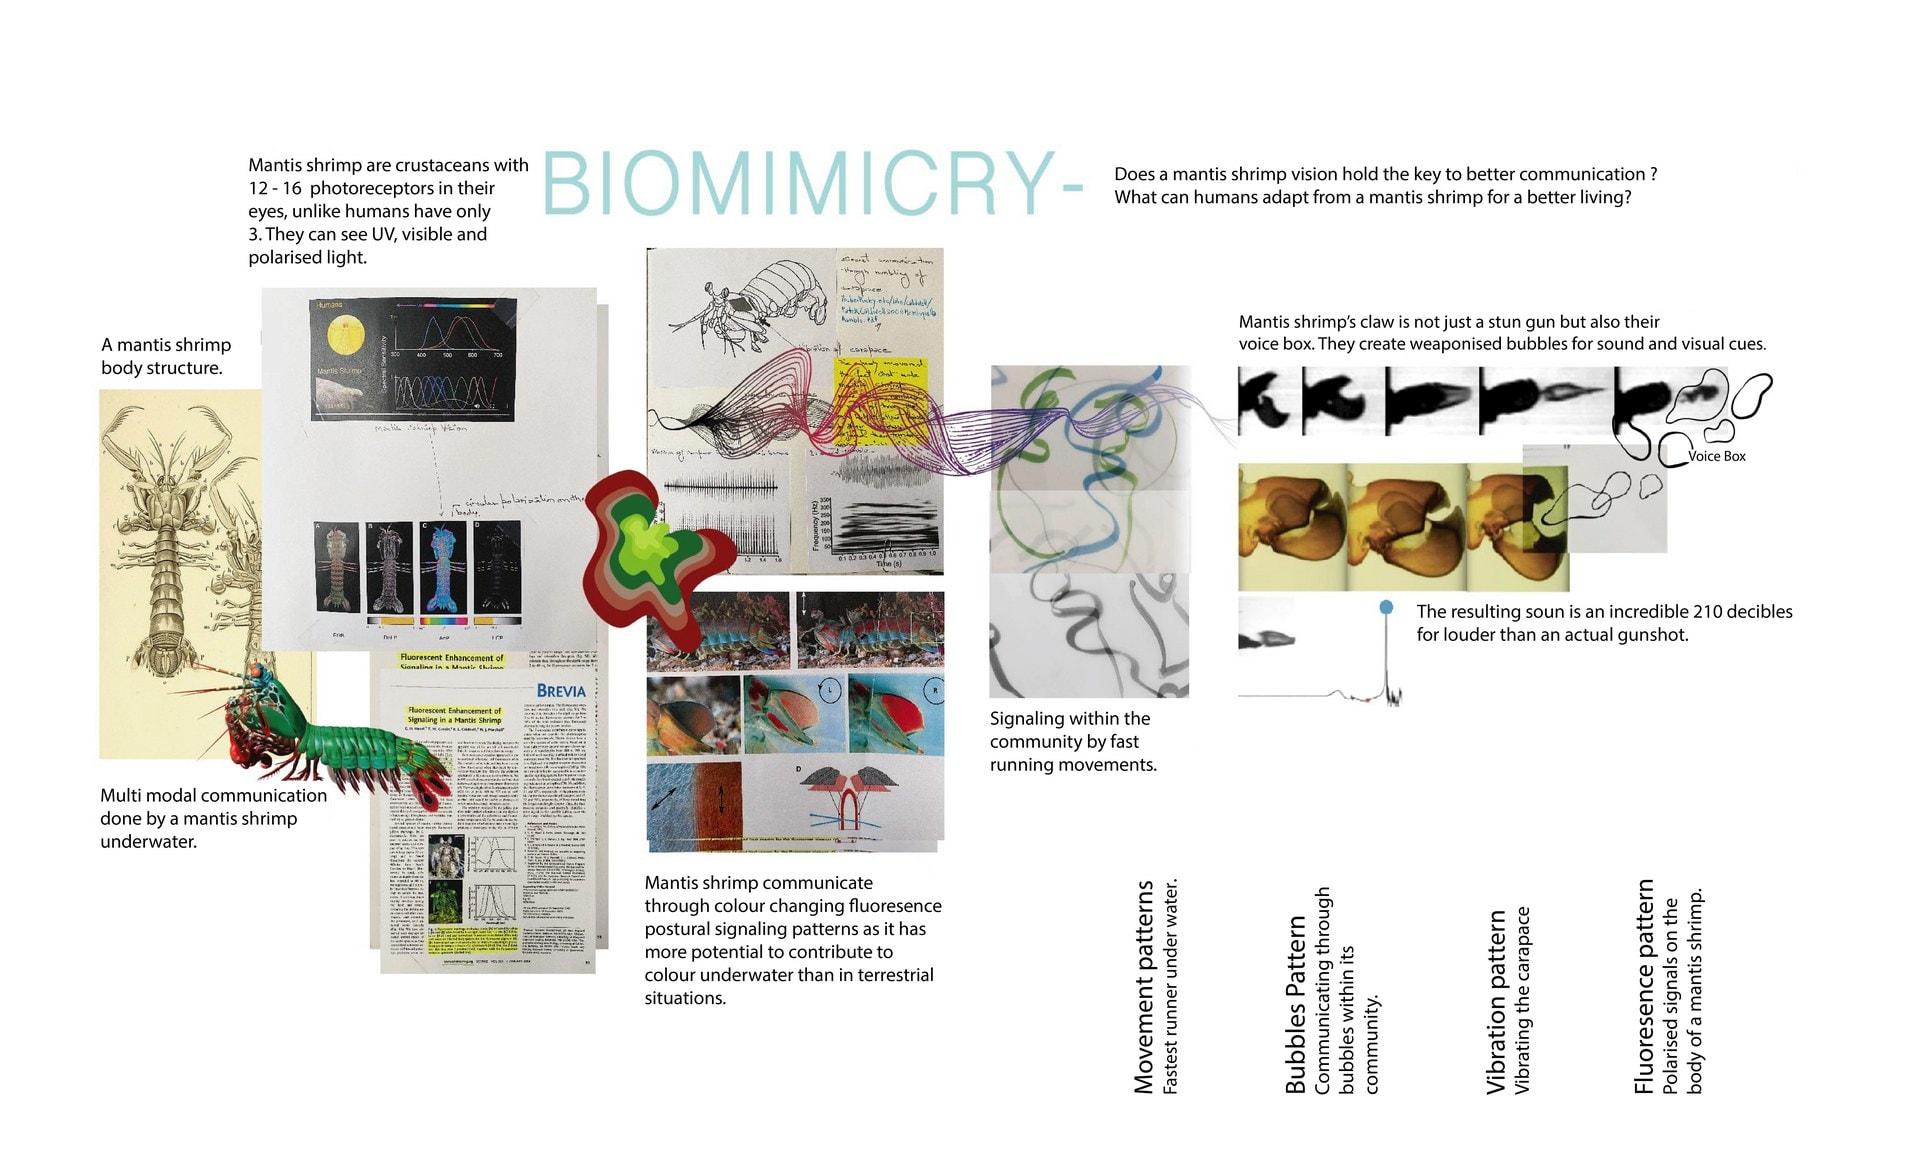 Biomimicry of a Mantis shrimp